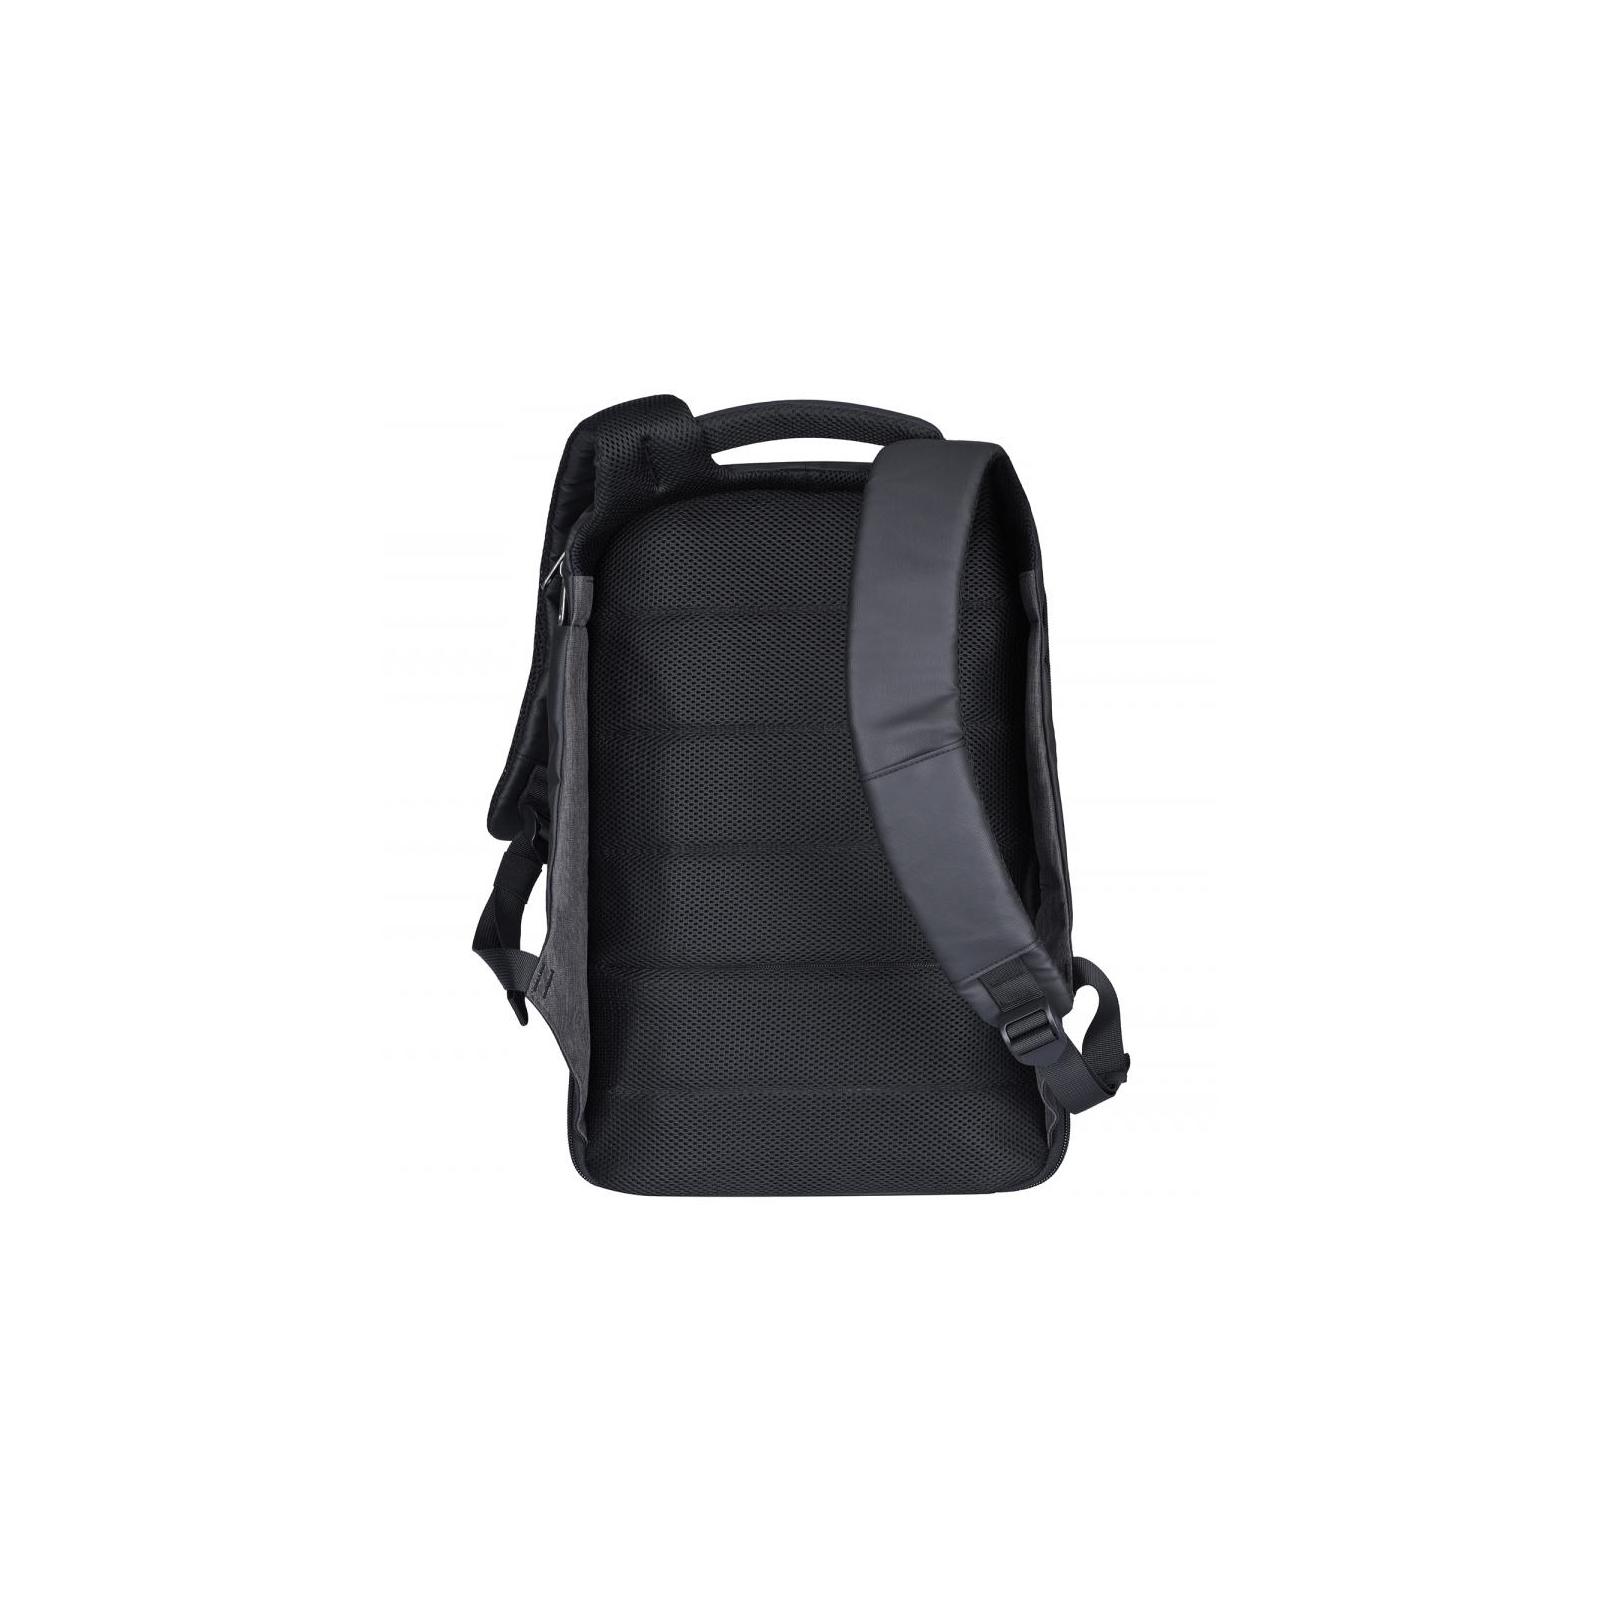 "Рюкзак для ноутбука 2E 16"" BPK63148 Black (2E-BPK63148BK) изображение 3"